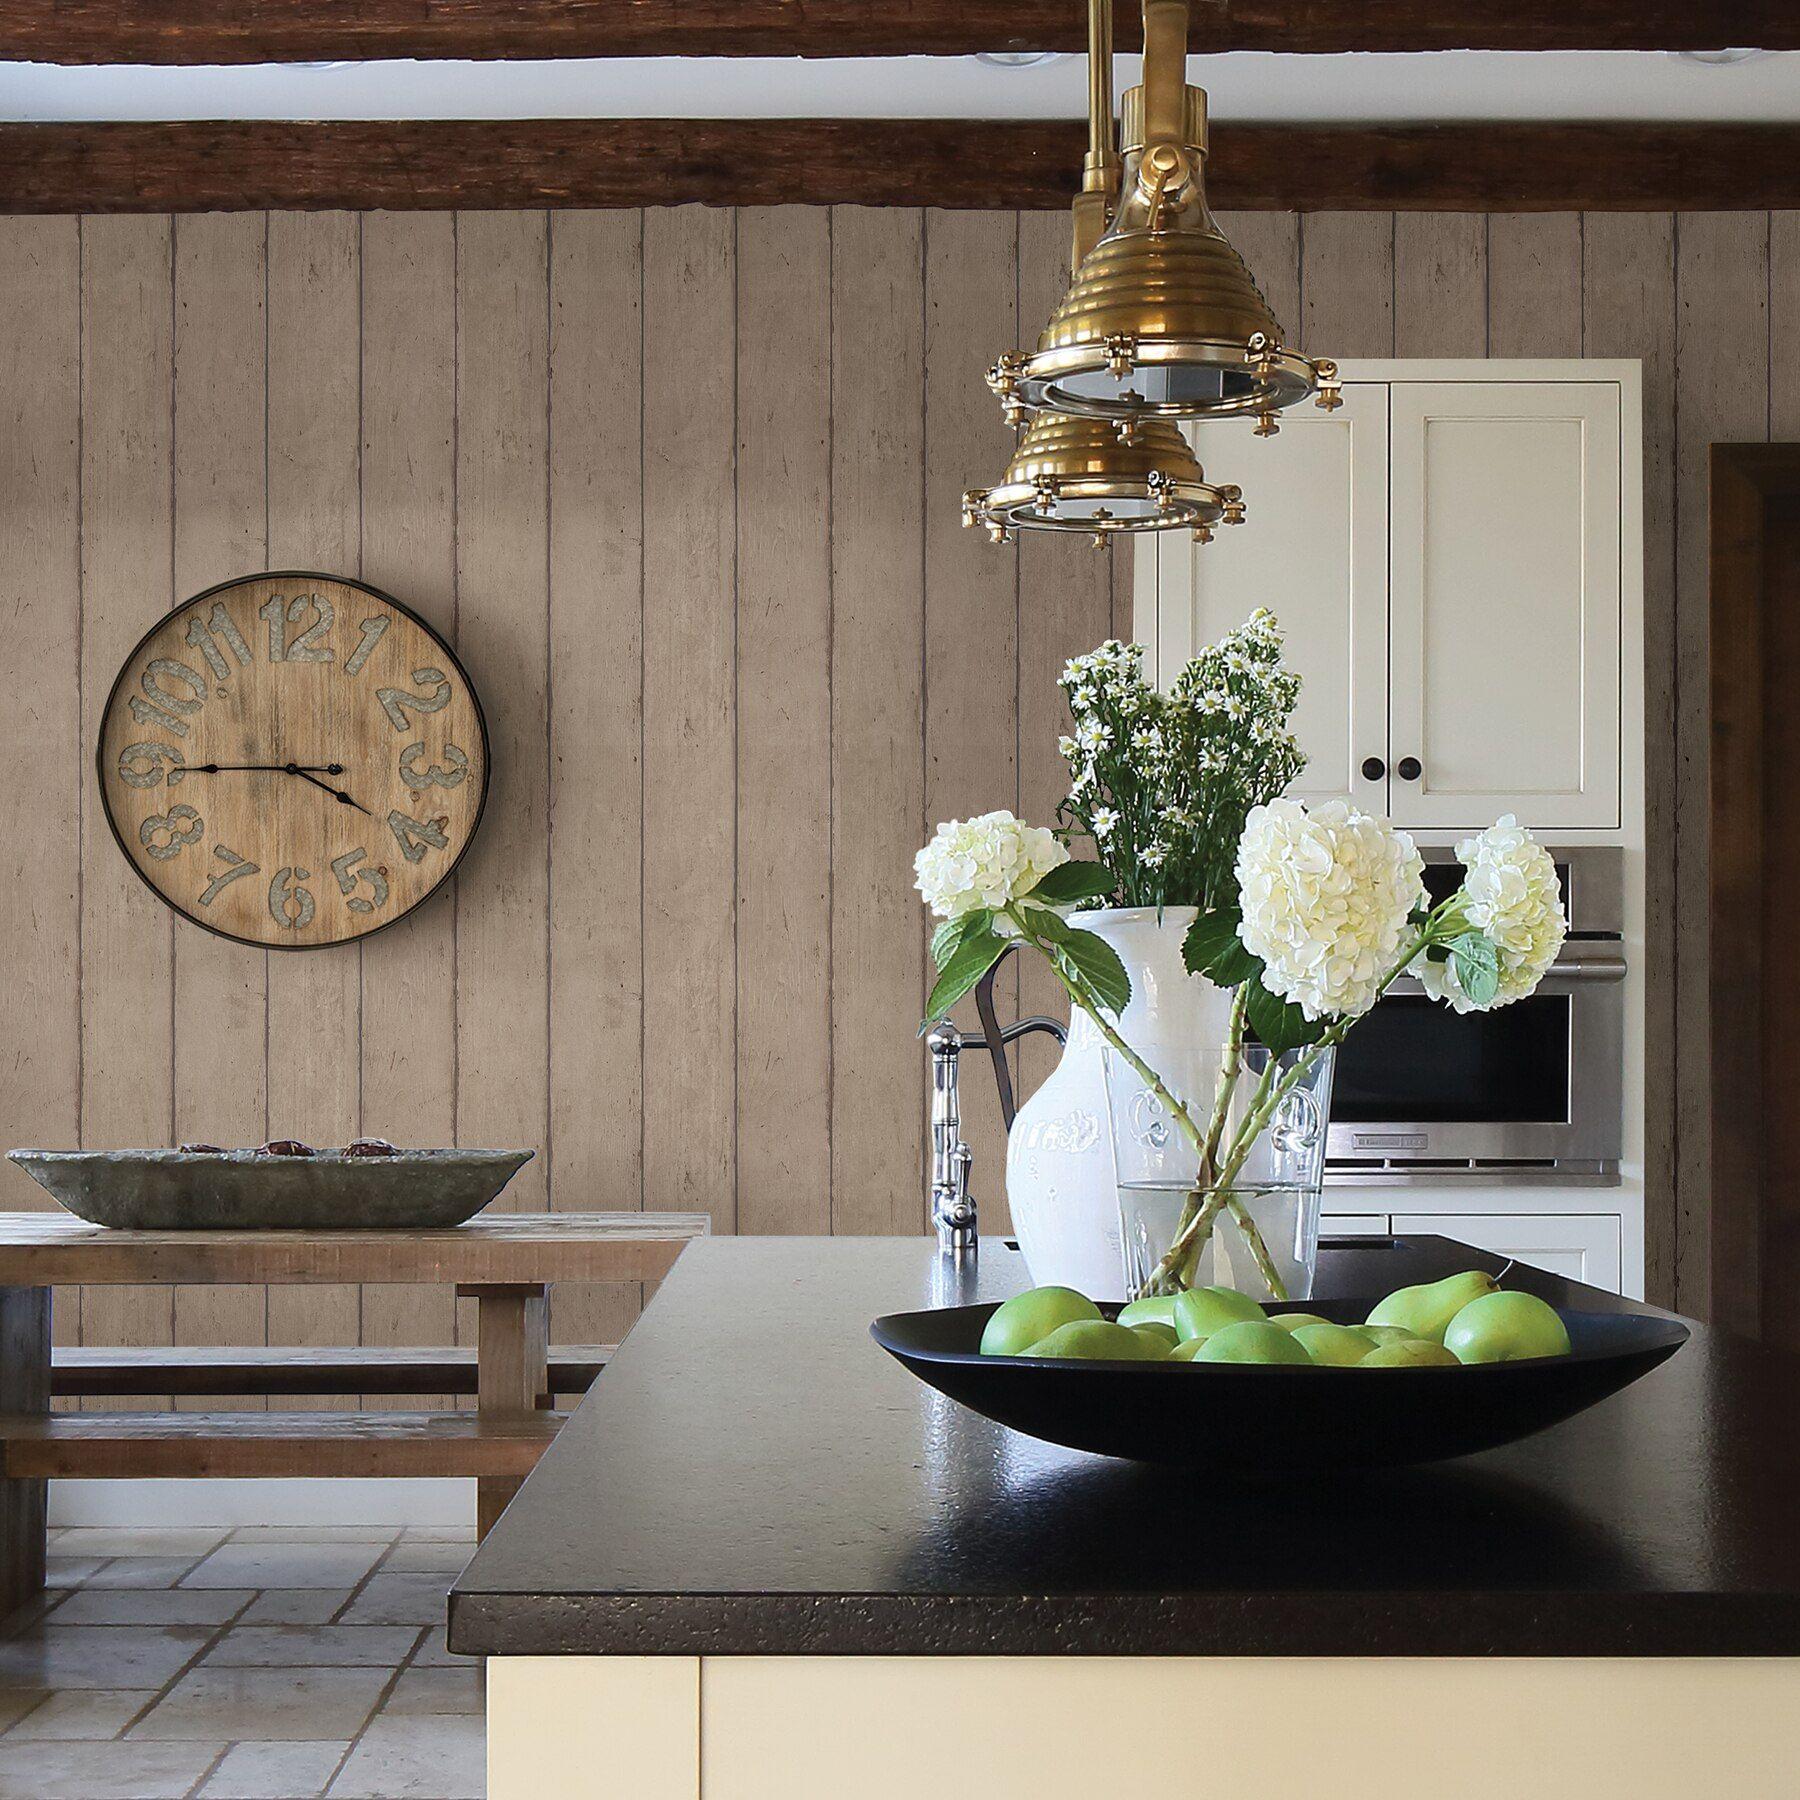 Teton wood plank light brown Stone wallpaper